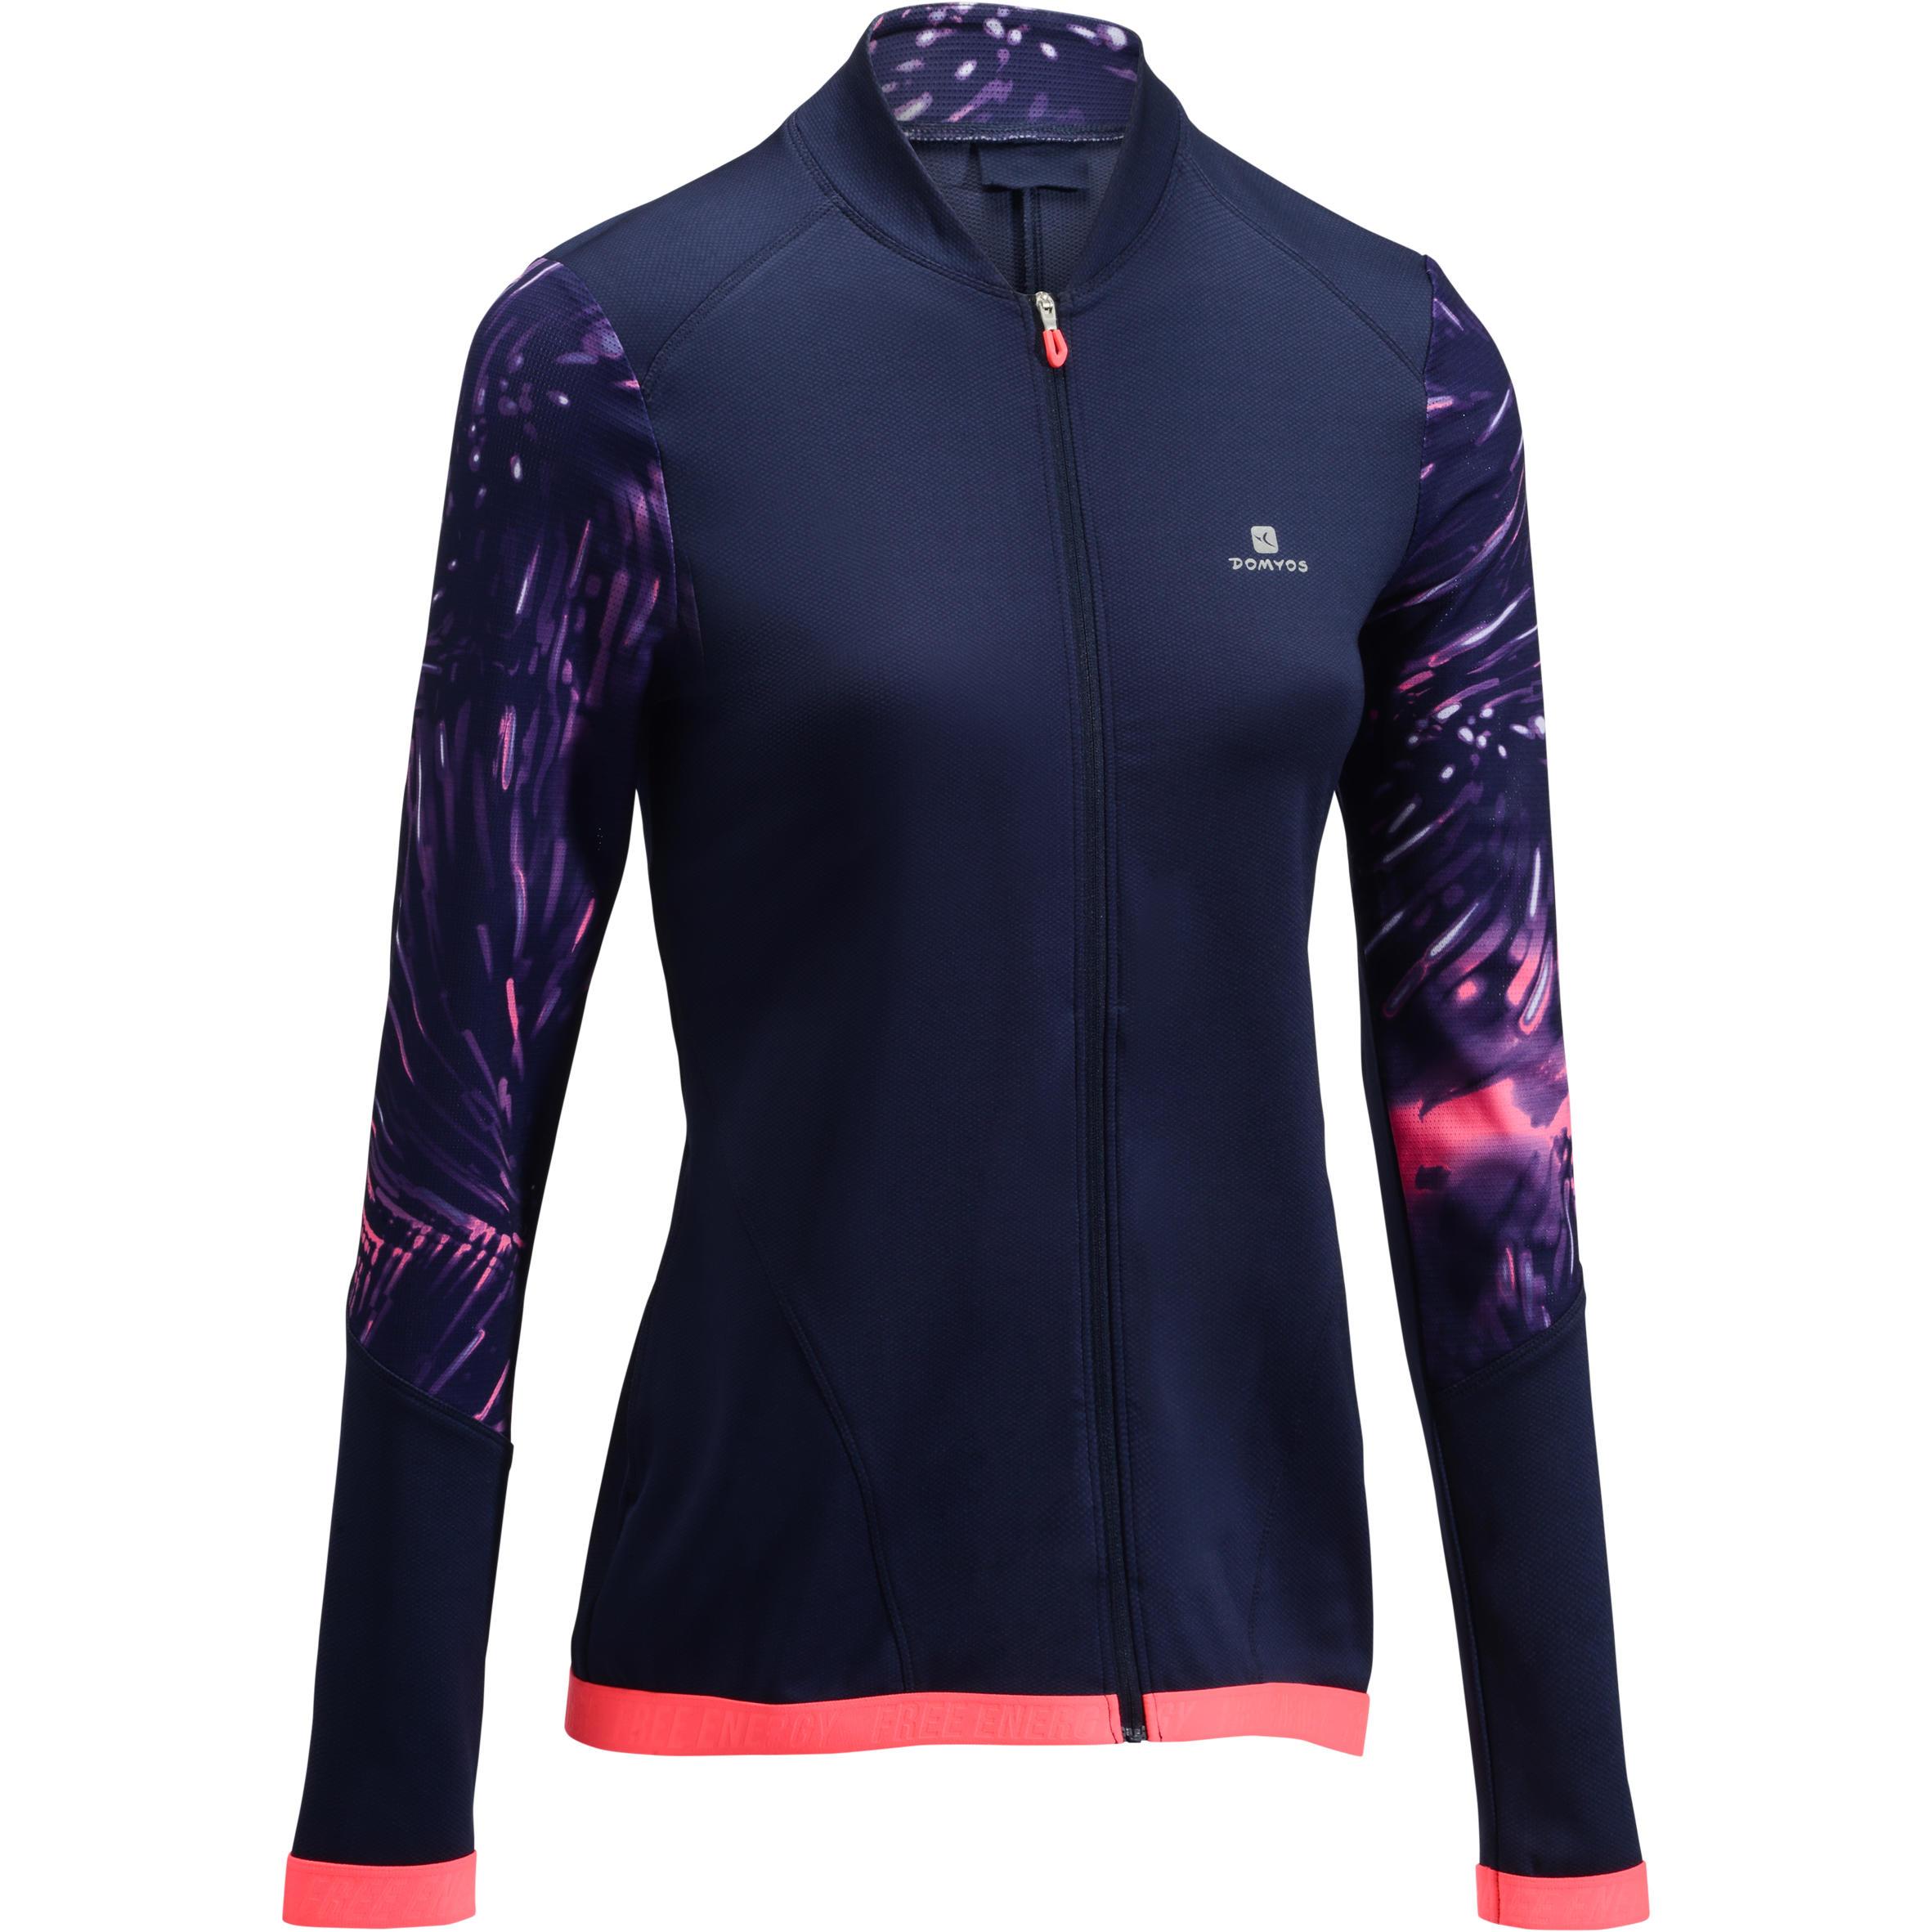 Domyos Fitnesssweater cardiotraining blauw met roze print 500 Domyos